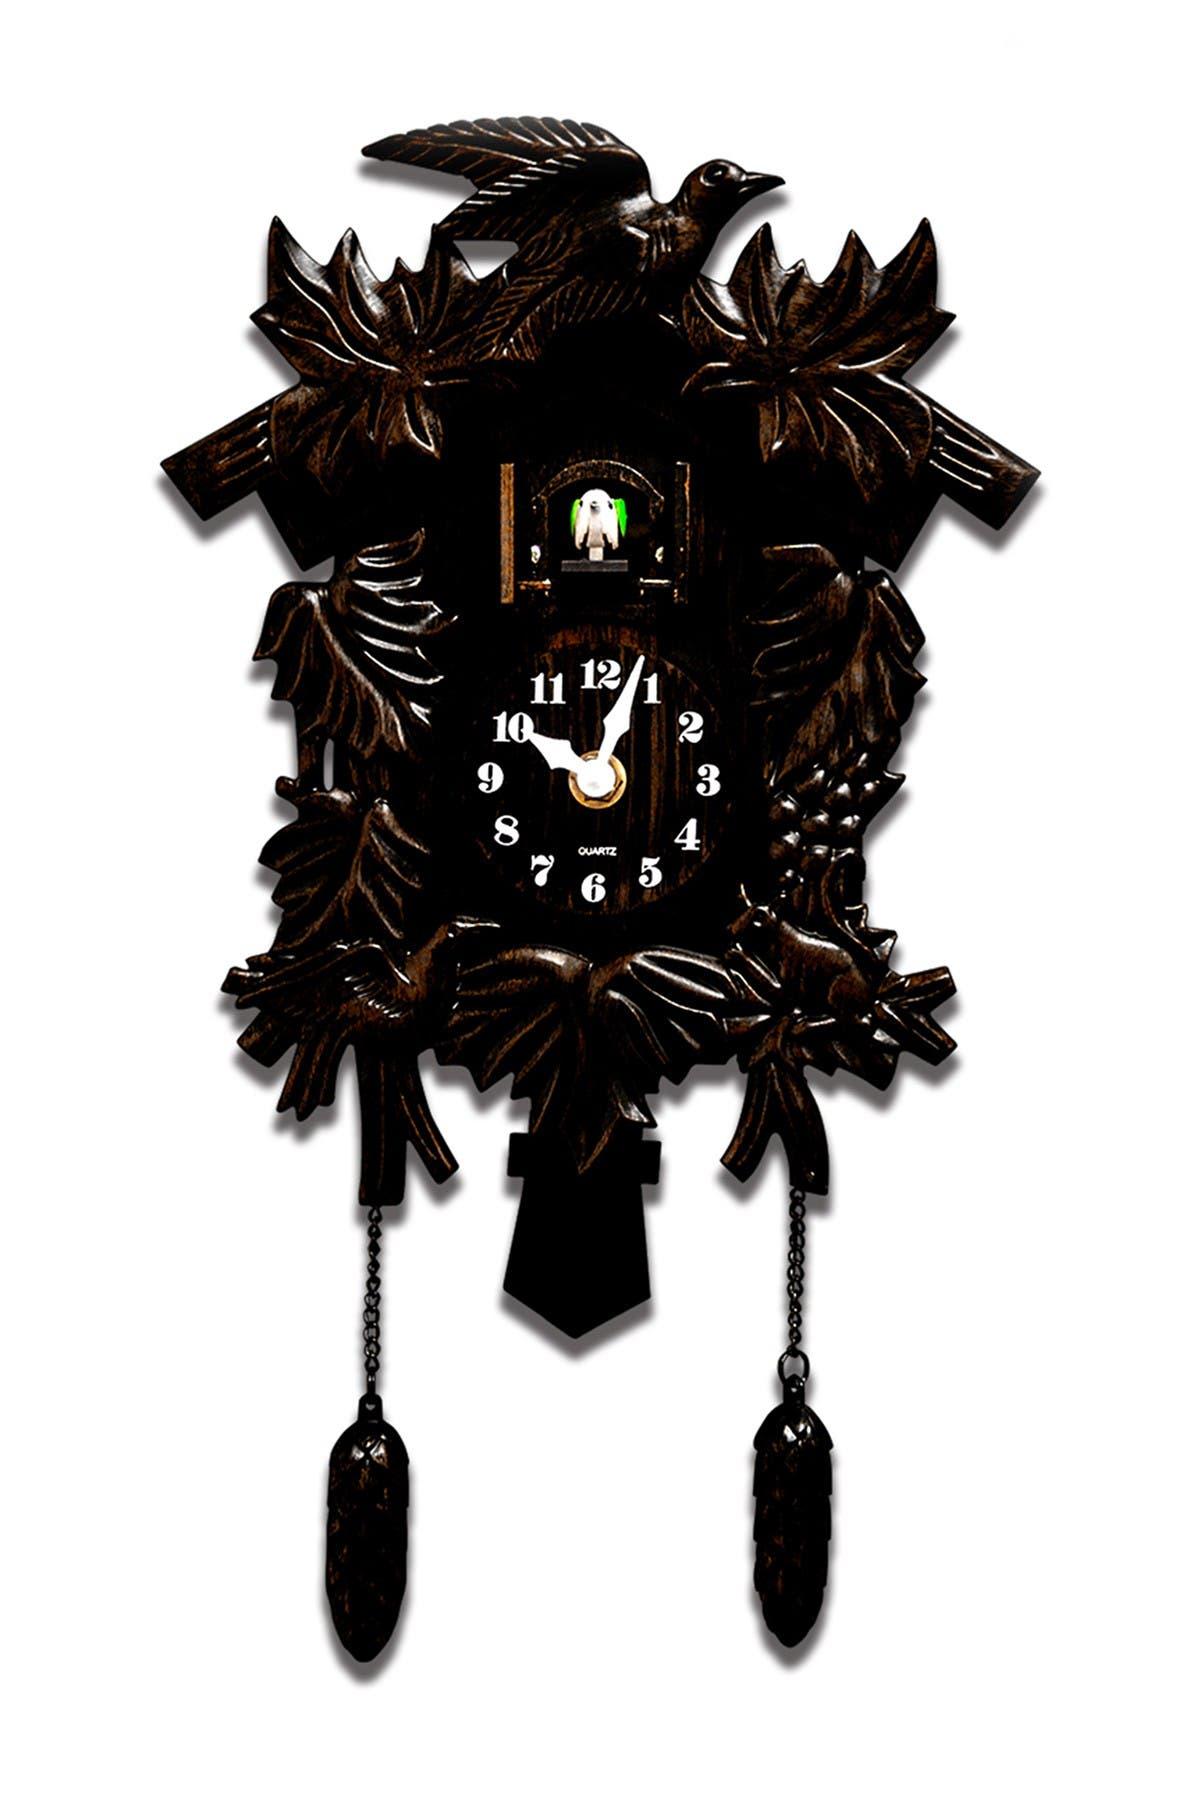 Image of WalPlus Antique Hamburg Black Forest Cuckoo Bronze Wall Clock Decal